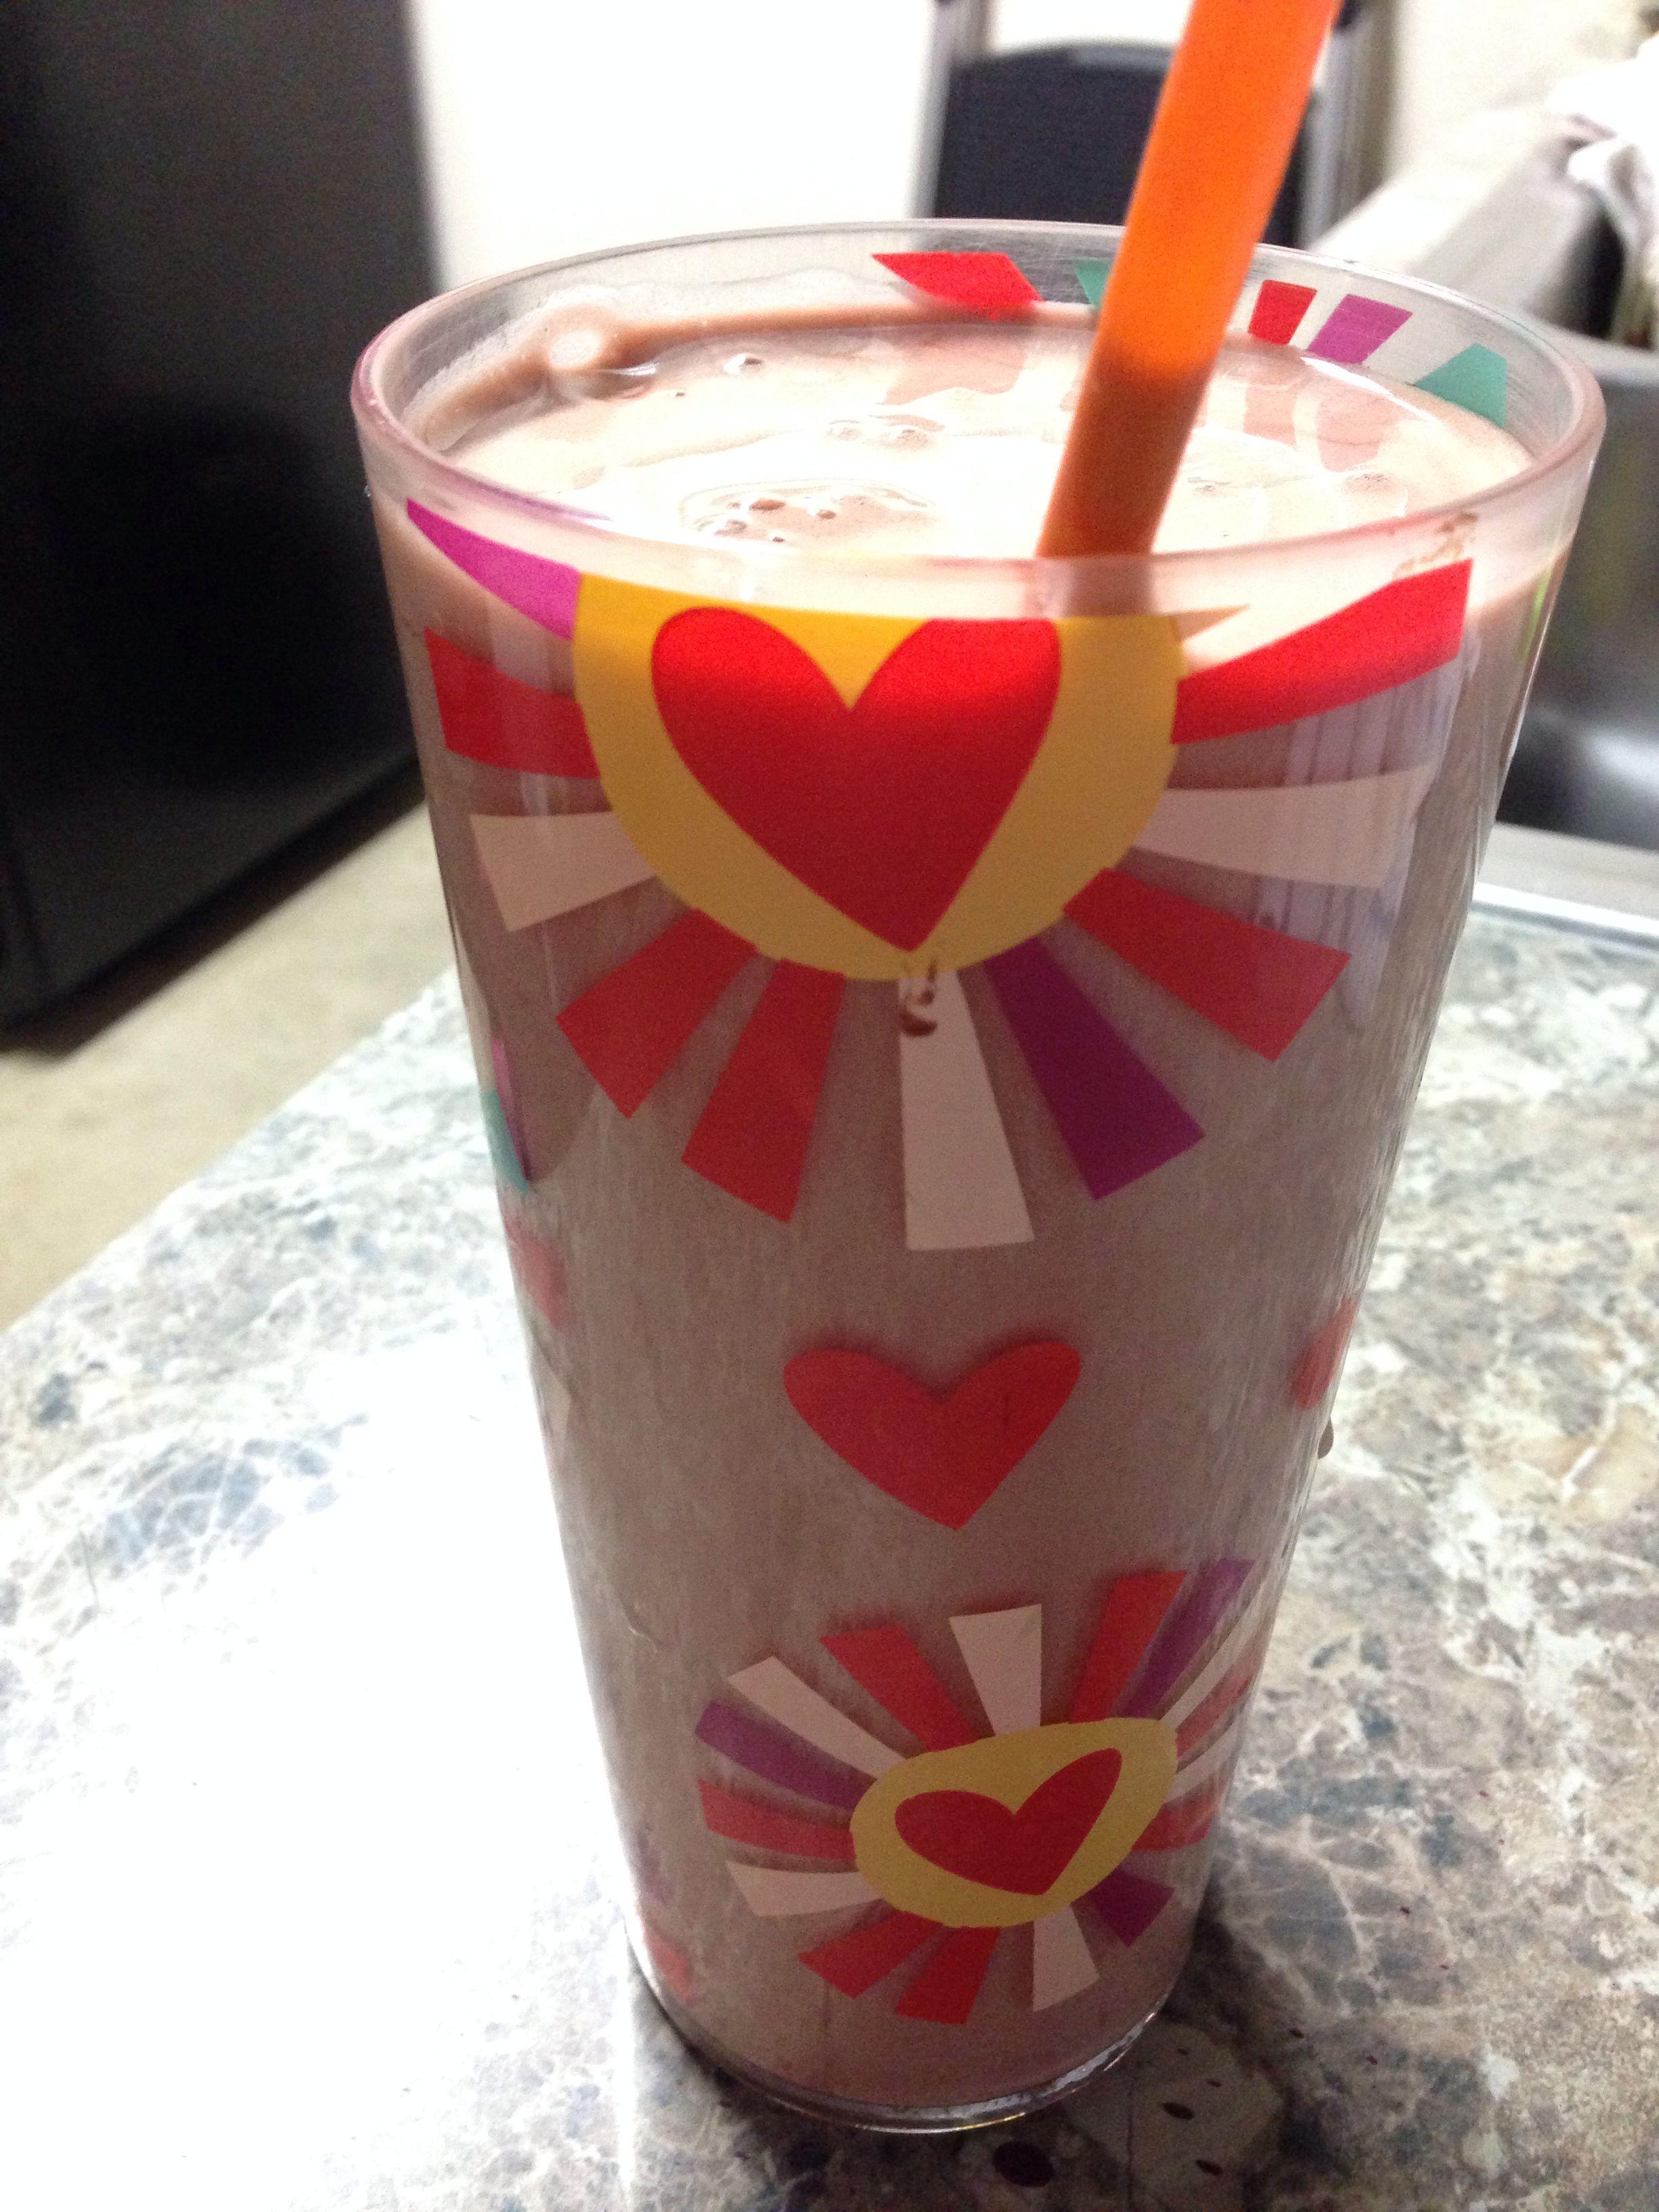 Hmr chocolate covered strawberry shake hmr 70 and